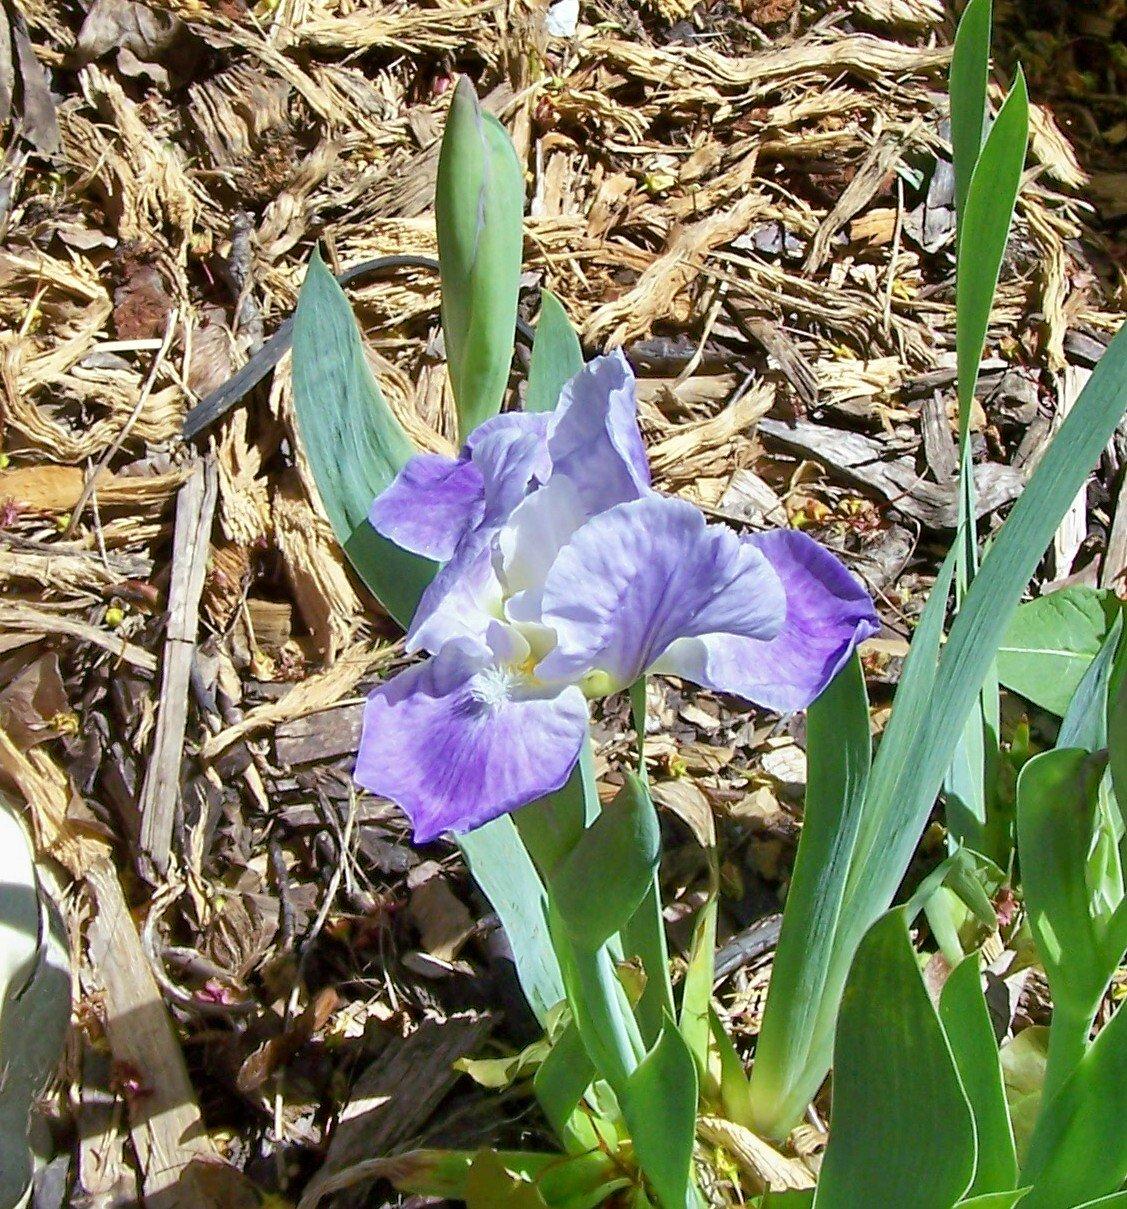 Violet Lulu Dwarf Bearded ( Iris ) - 1 plant division ~gemsandstems.info~